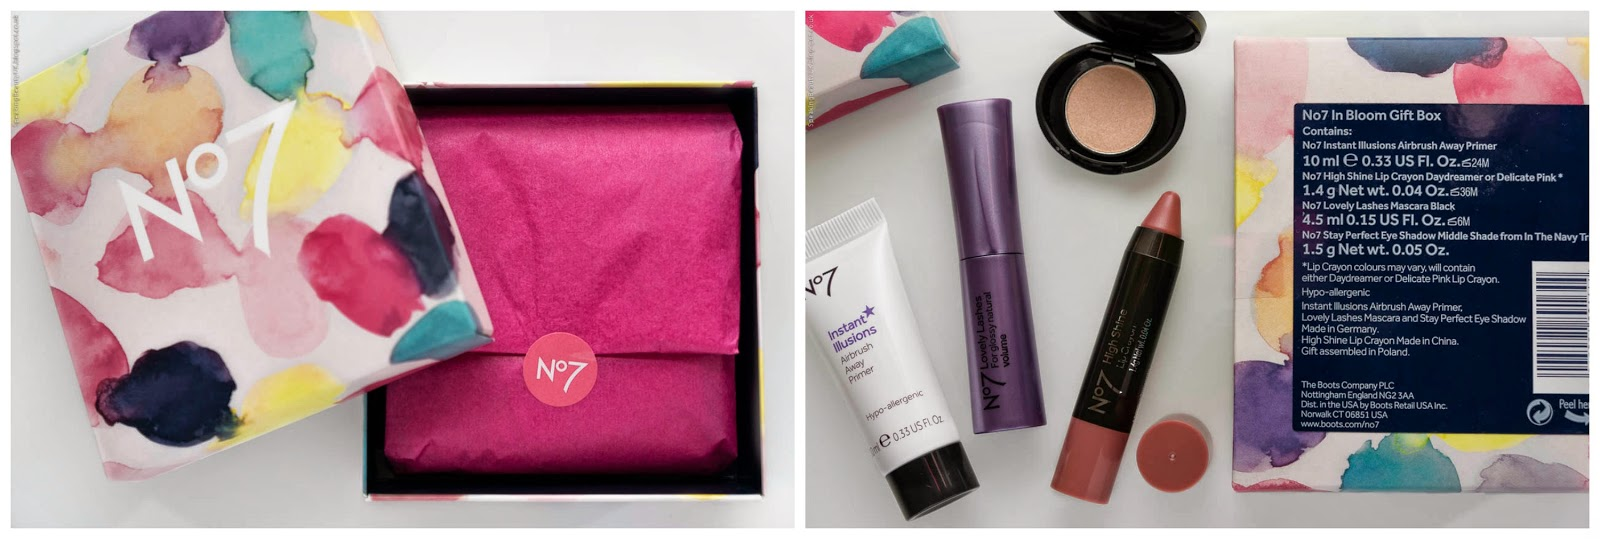 No7 Gift Box